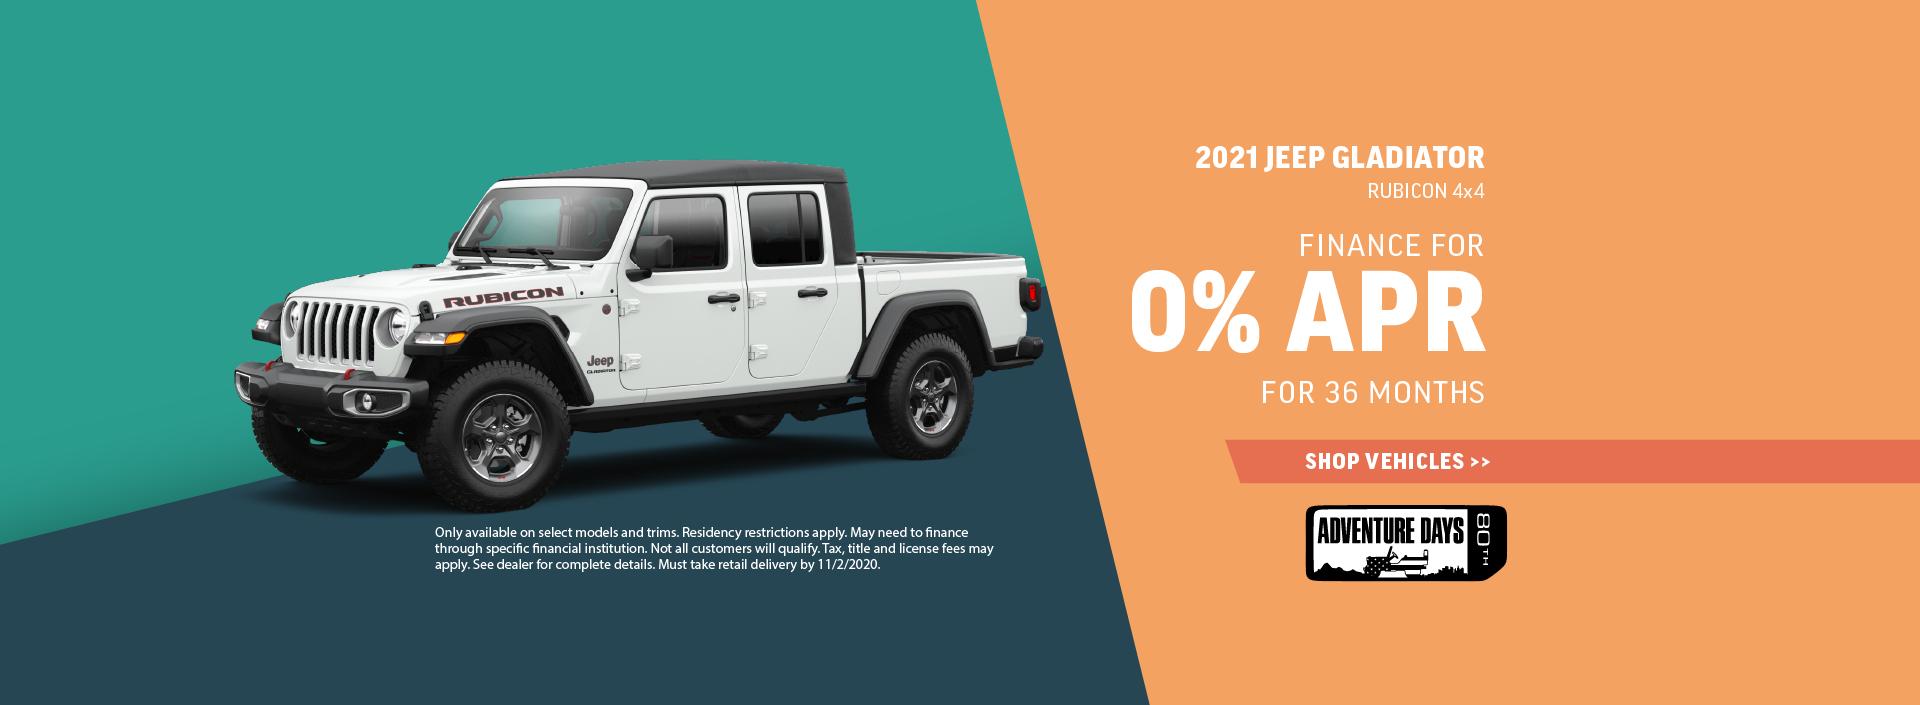 2020 Jeep Gladiator Offer